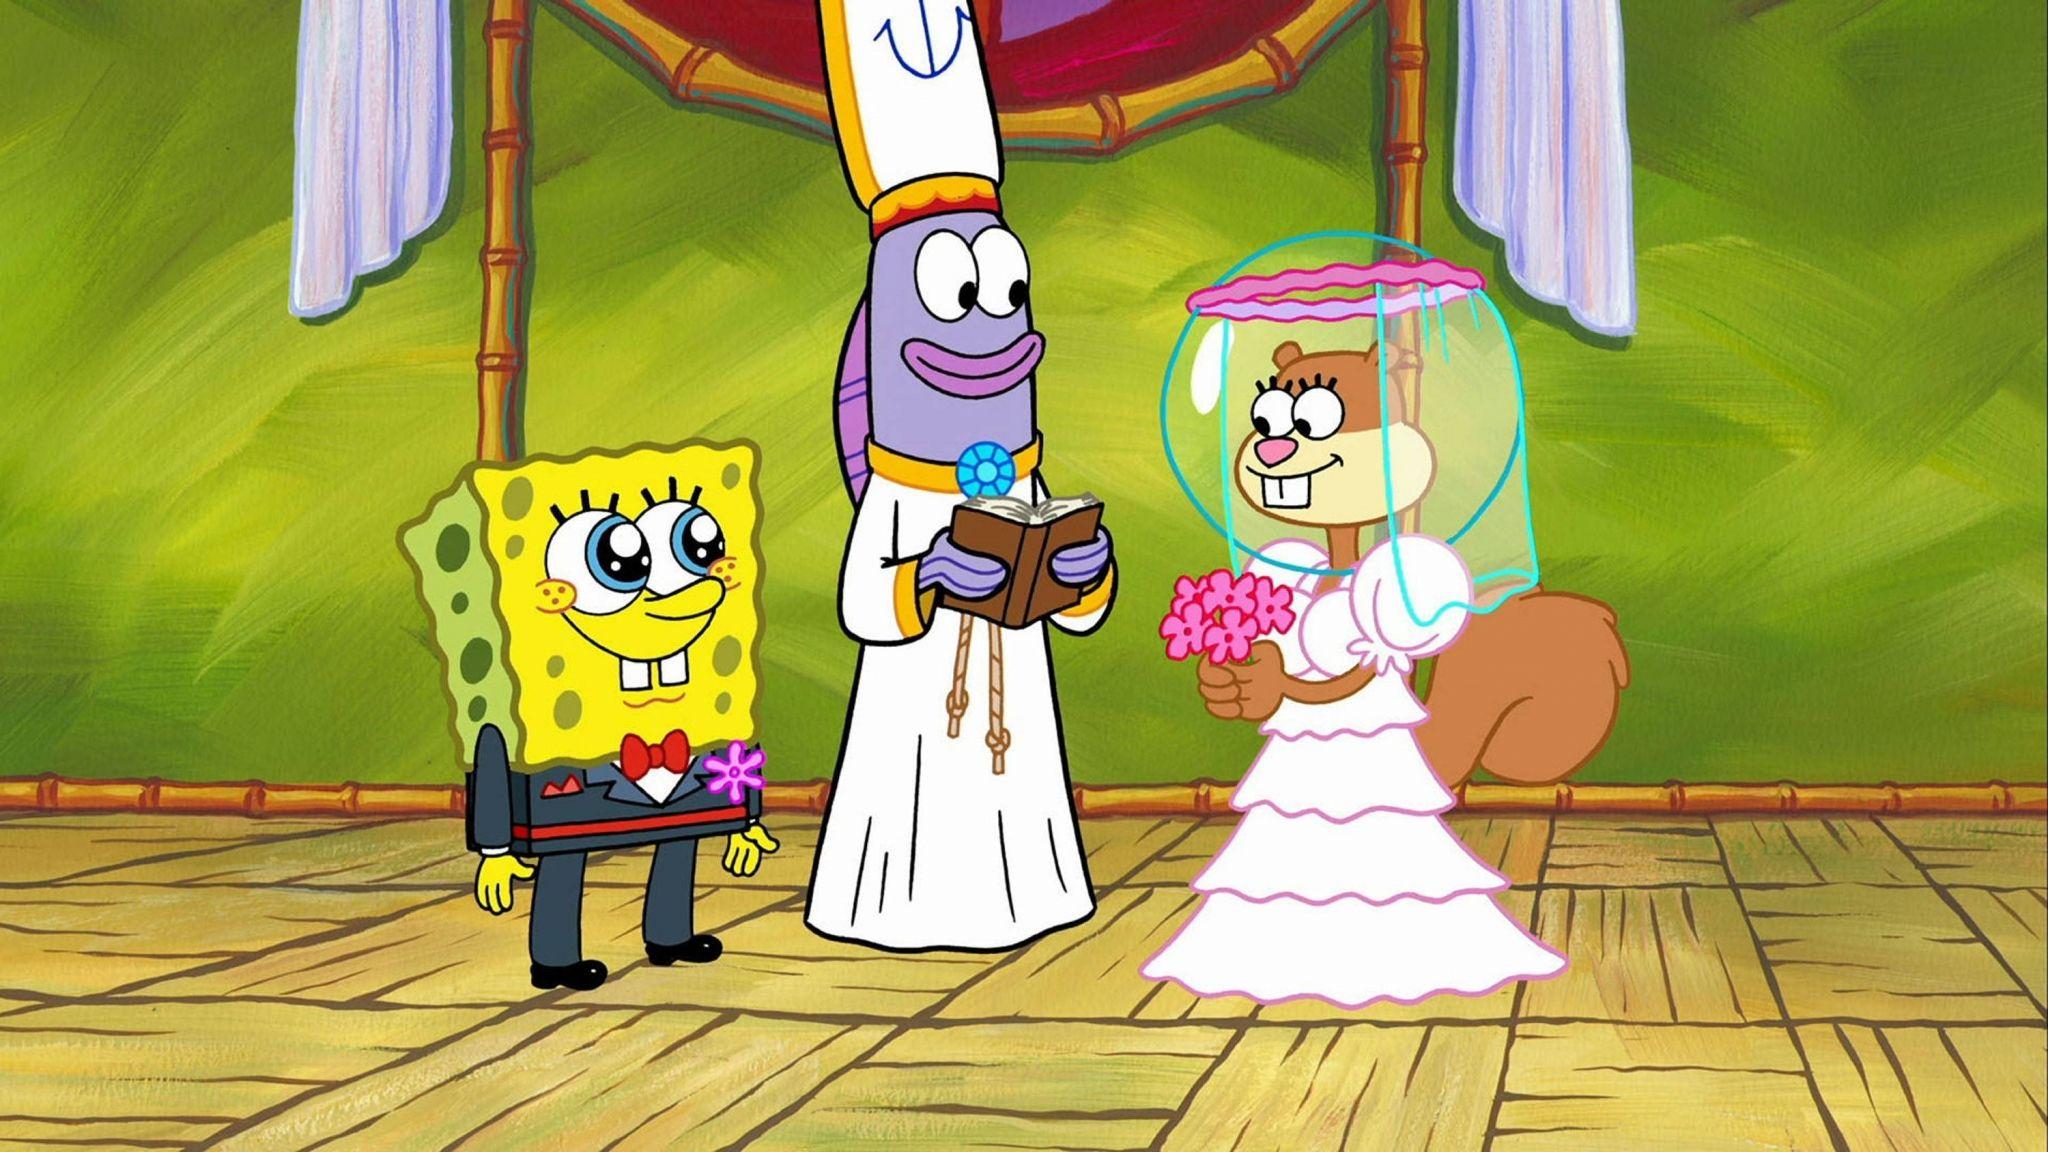 spongebob snail meme